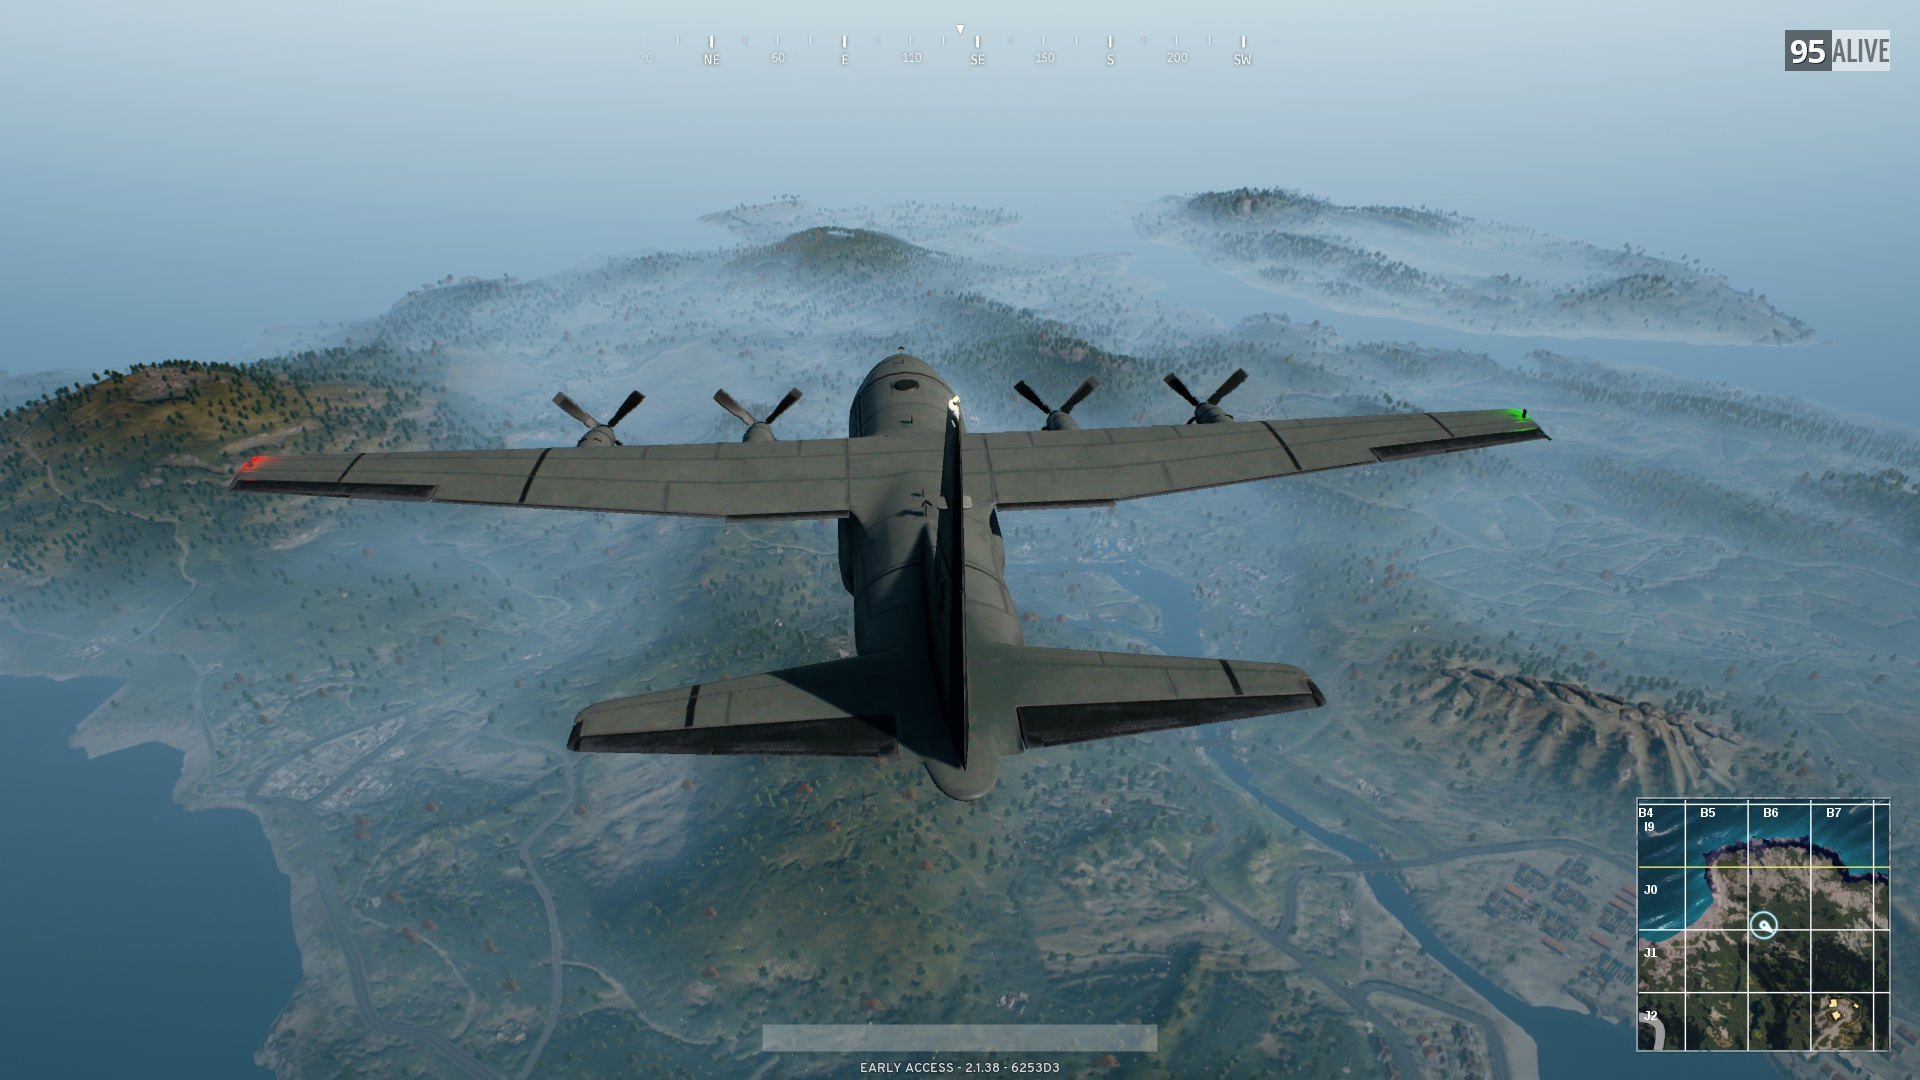 battlegrounds-cargo-plane The Existential Terror of Battle Royale - battlegrounds cargo plane - The Existential Terror of Battle Royale